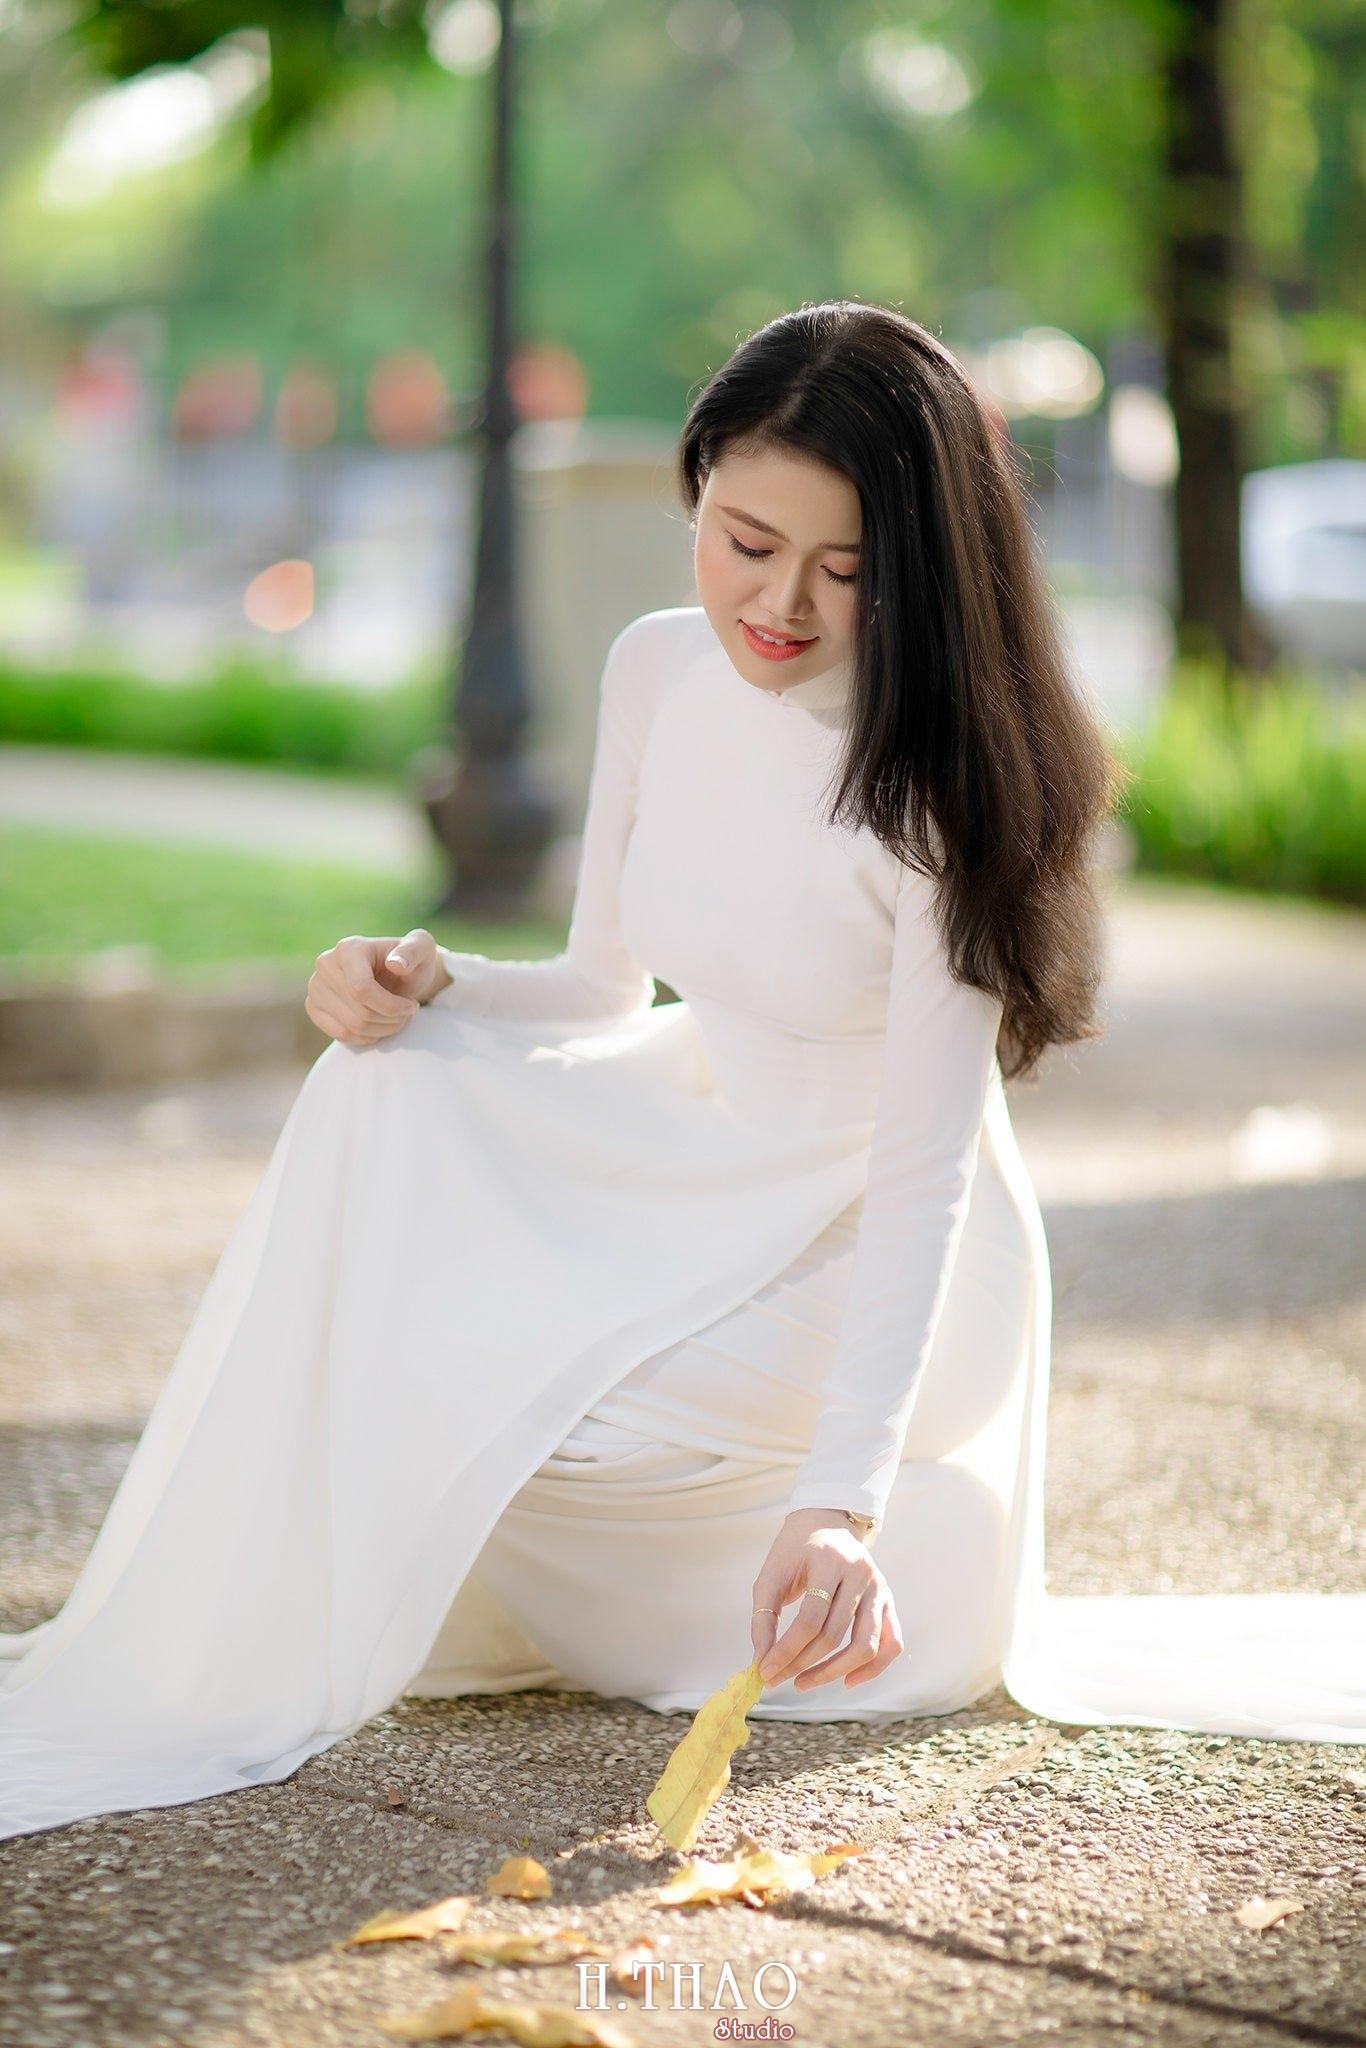 con gái mặc áo dài